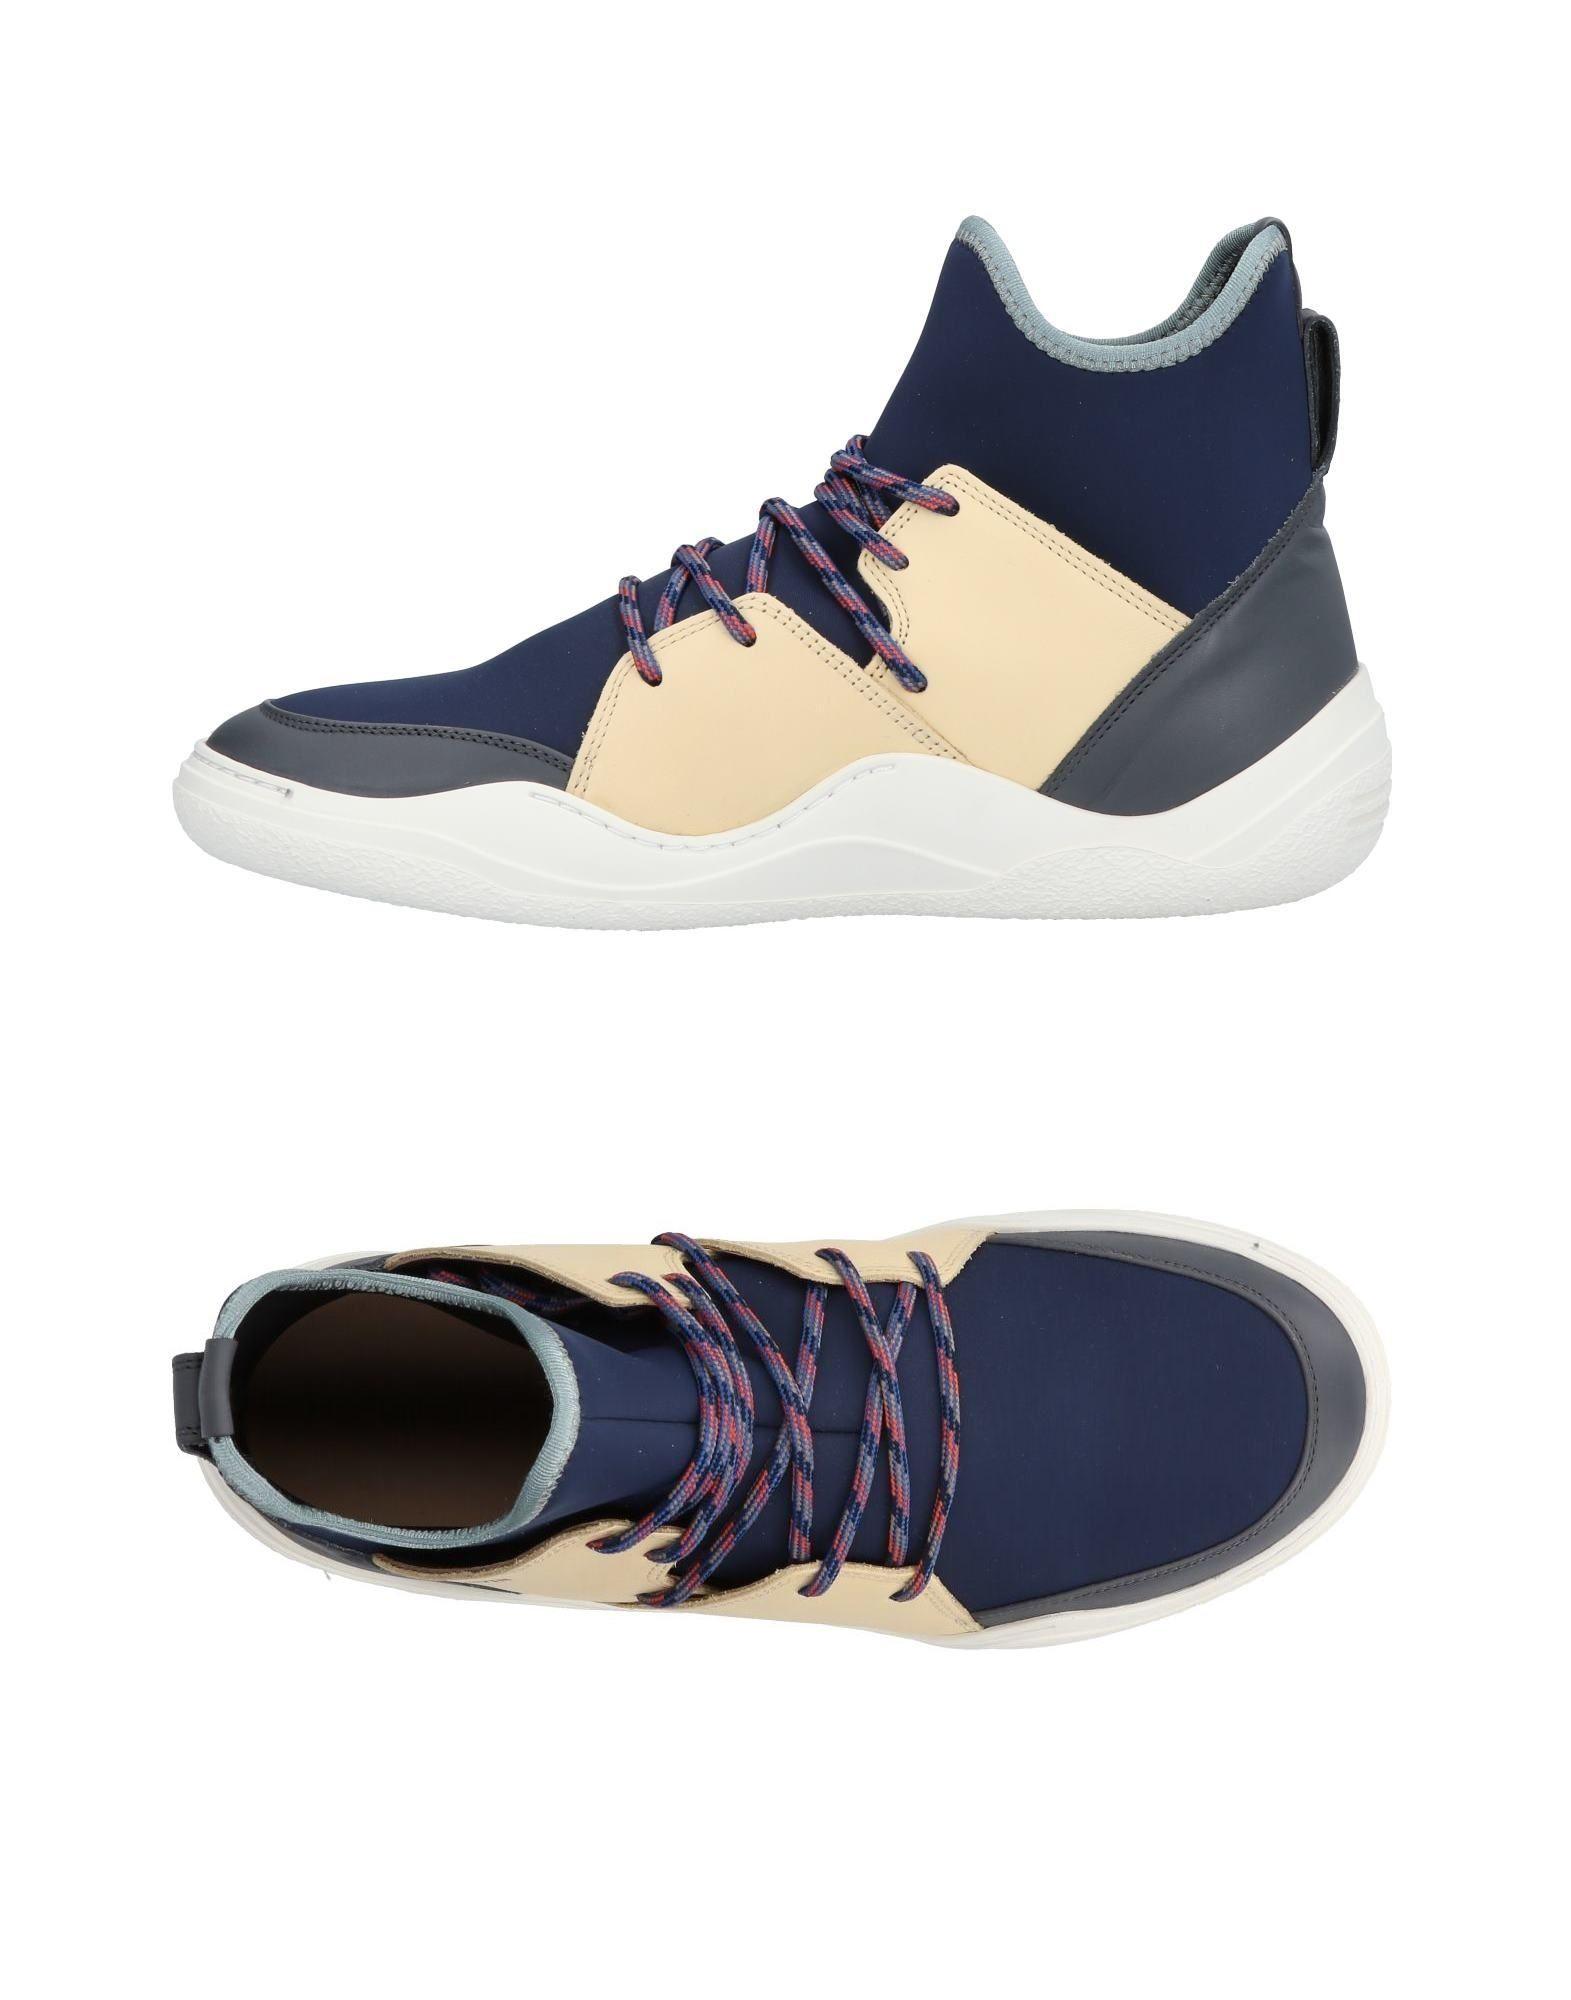 Lanvin Sneakers Herren  11465345LN Gute Qualität beliebte Schuhe